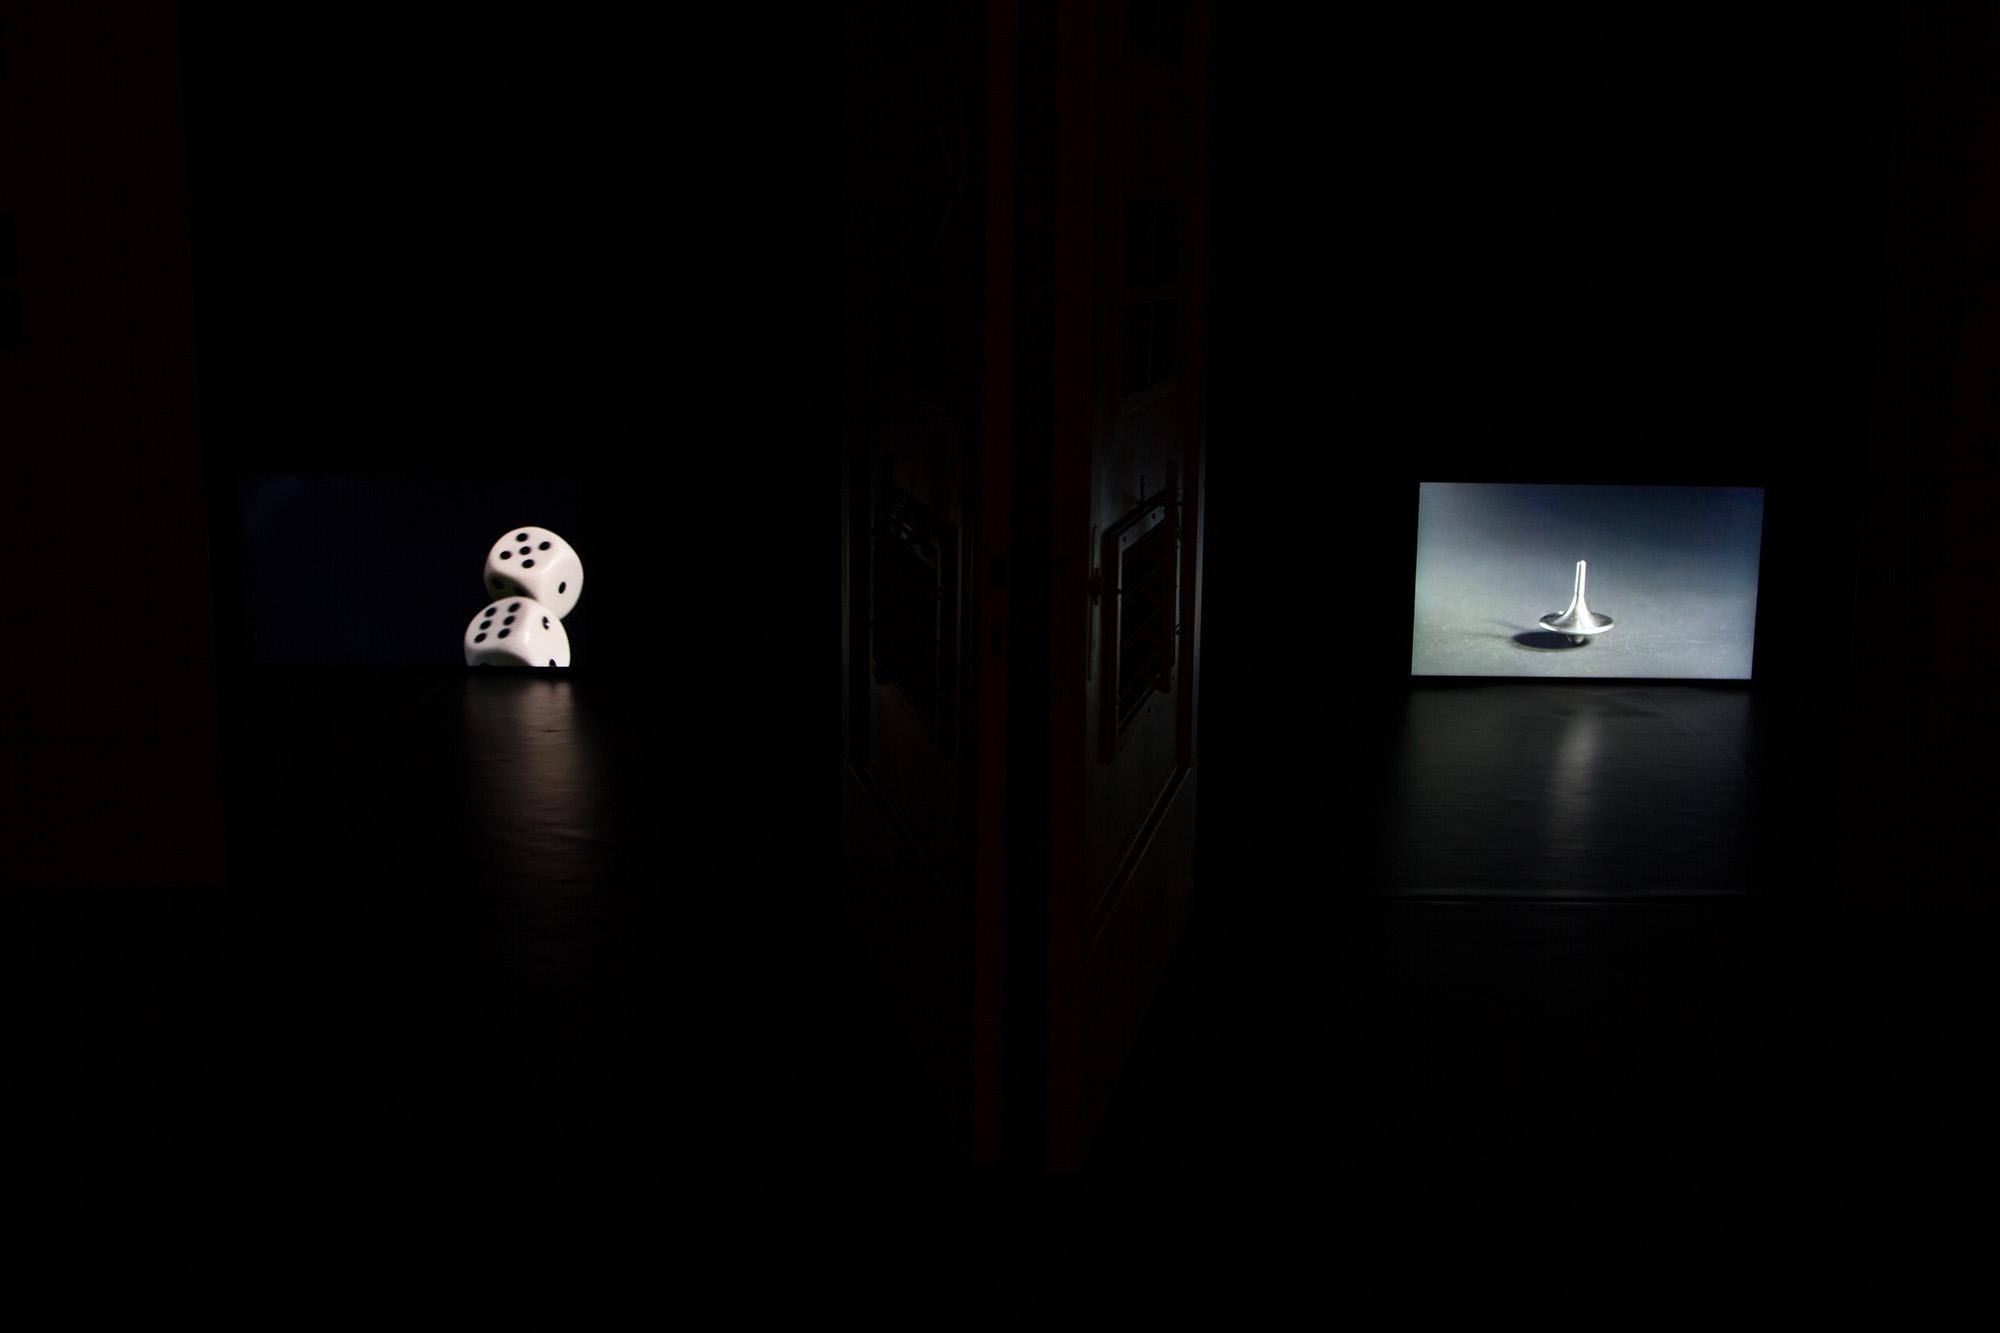 Alicja Kwade, In Ewig den Zufall Betrachtend, 2014; Kreisel (Inception), 2012, fot.Roman März